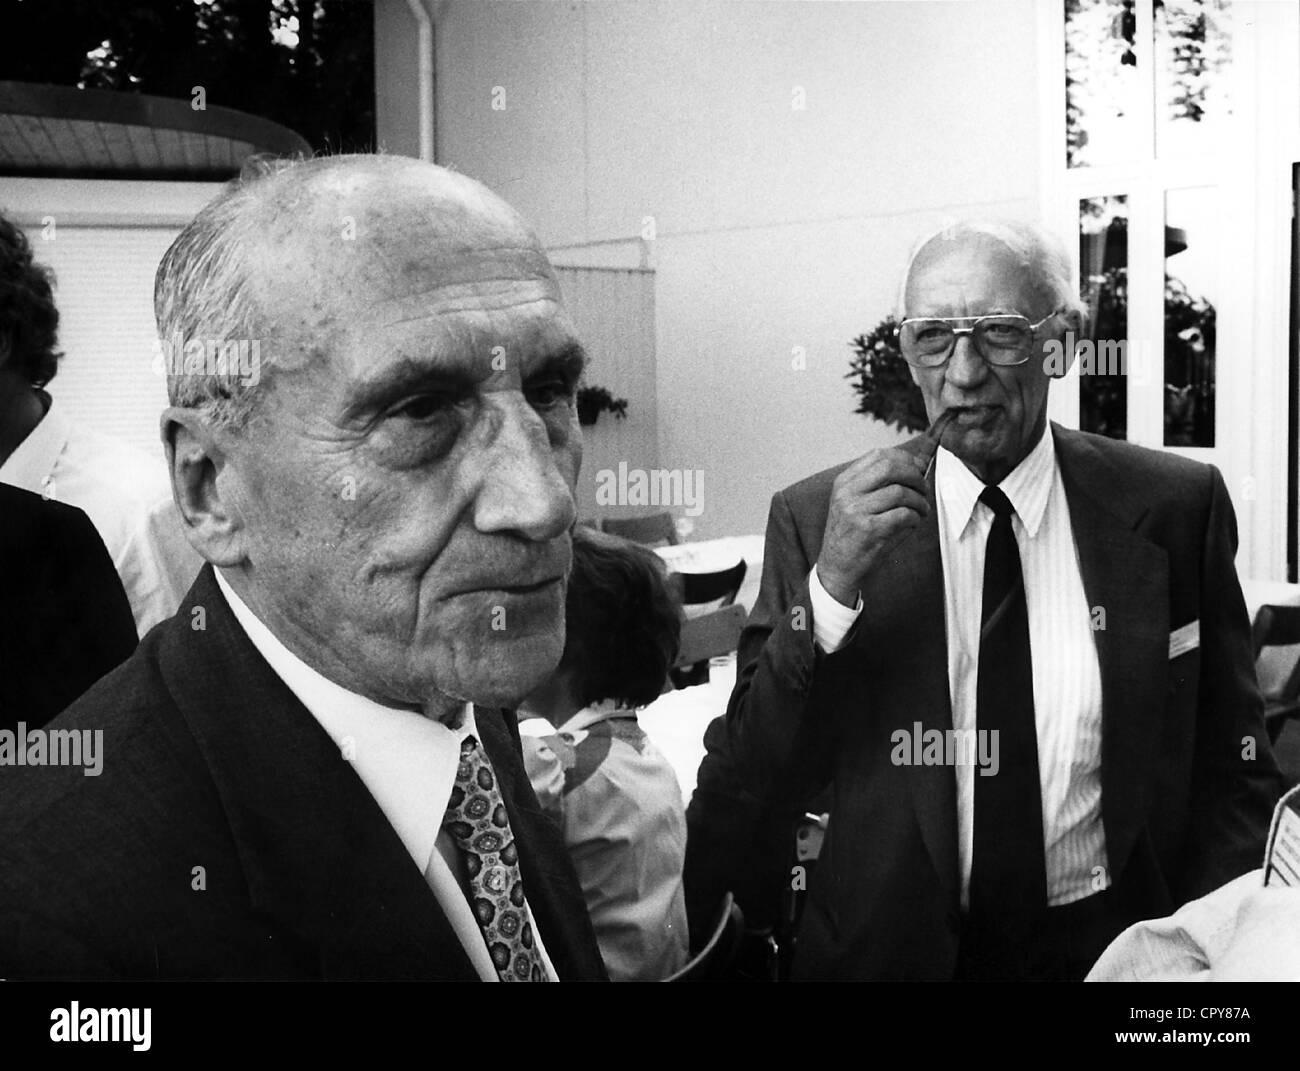 Prelog, Vladimir, 23.7.1906 - 7.1.1998, Swiss chemist of Bosnian origin, Nobel Prize laureate, at the Conference Stock Photo